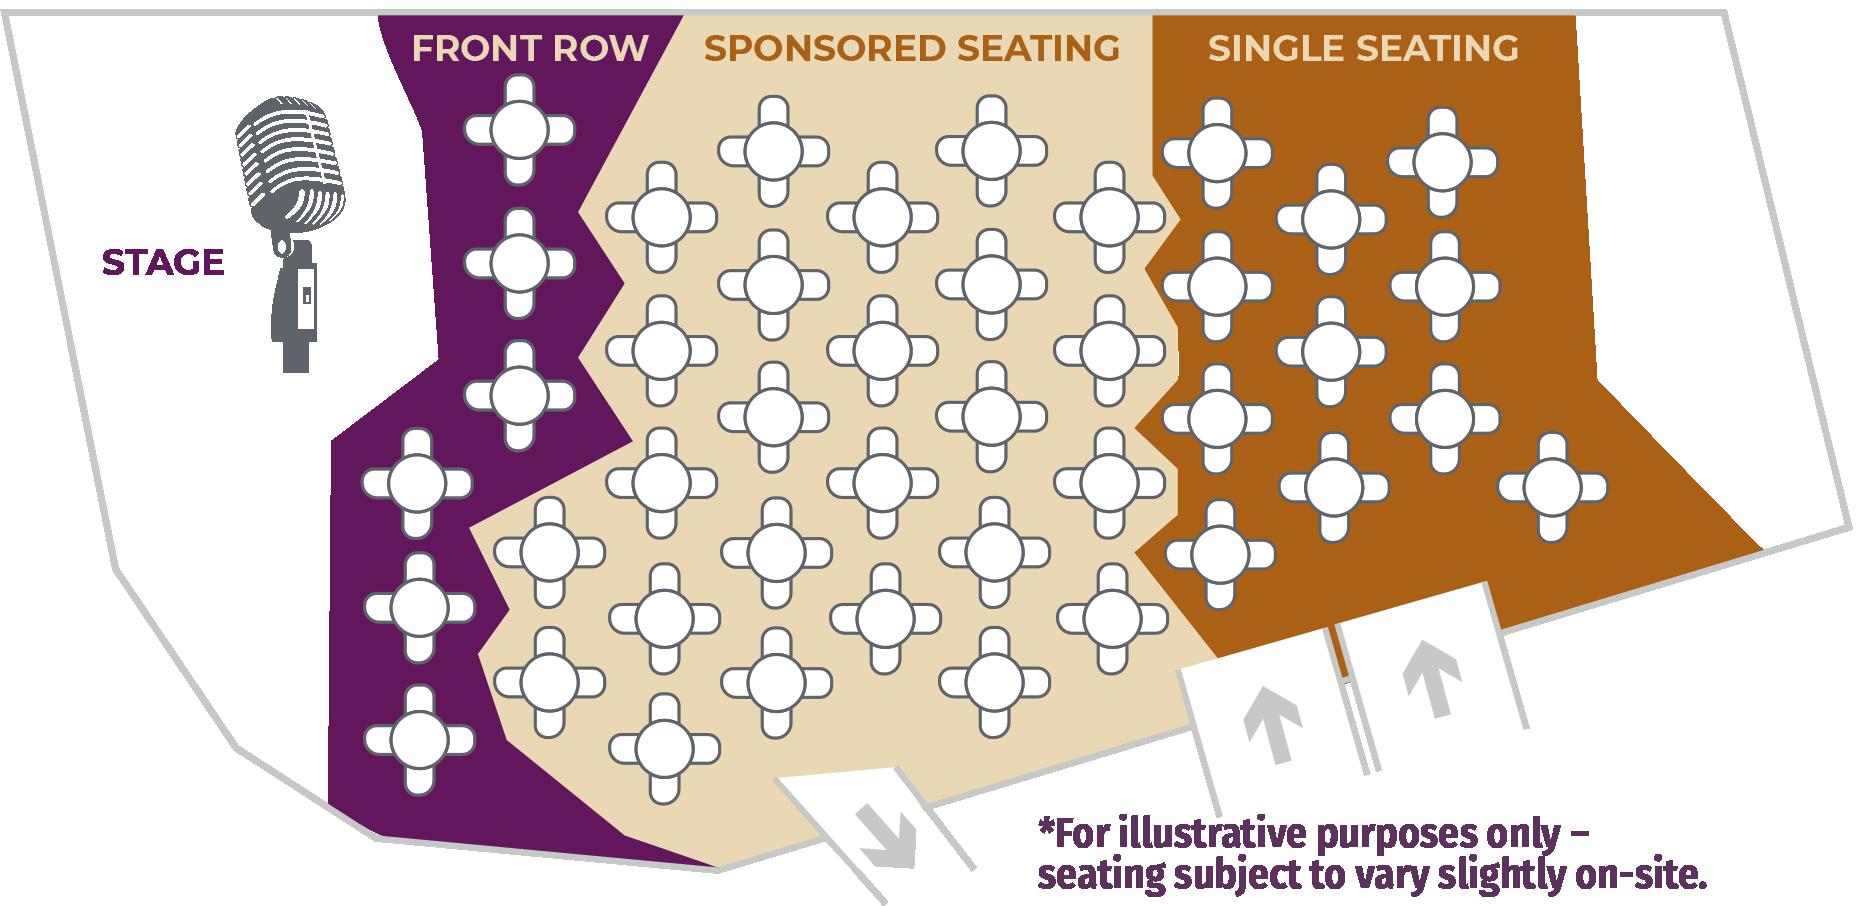 190115_comedy-slam_seating-chart-illustration